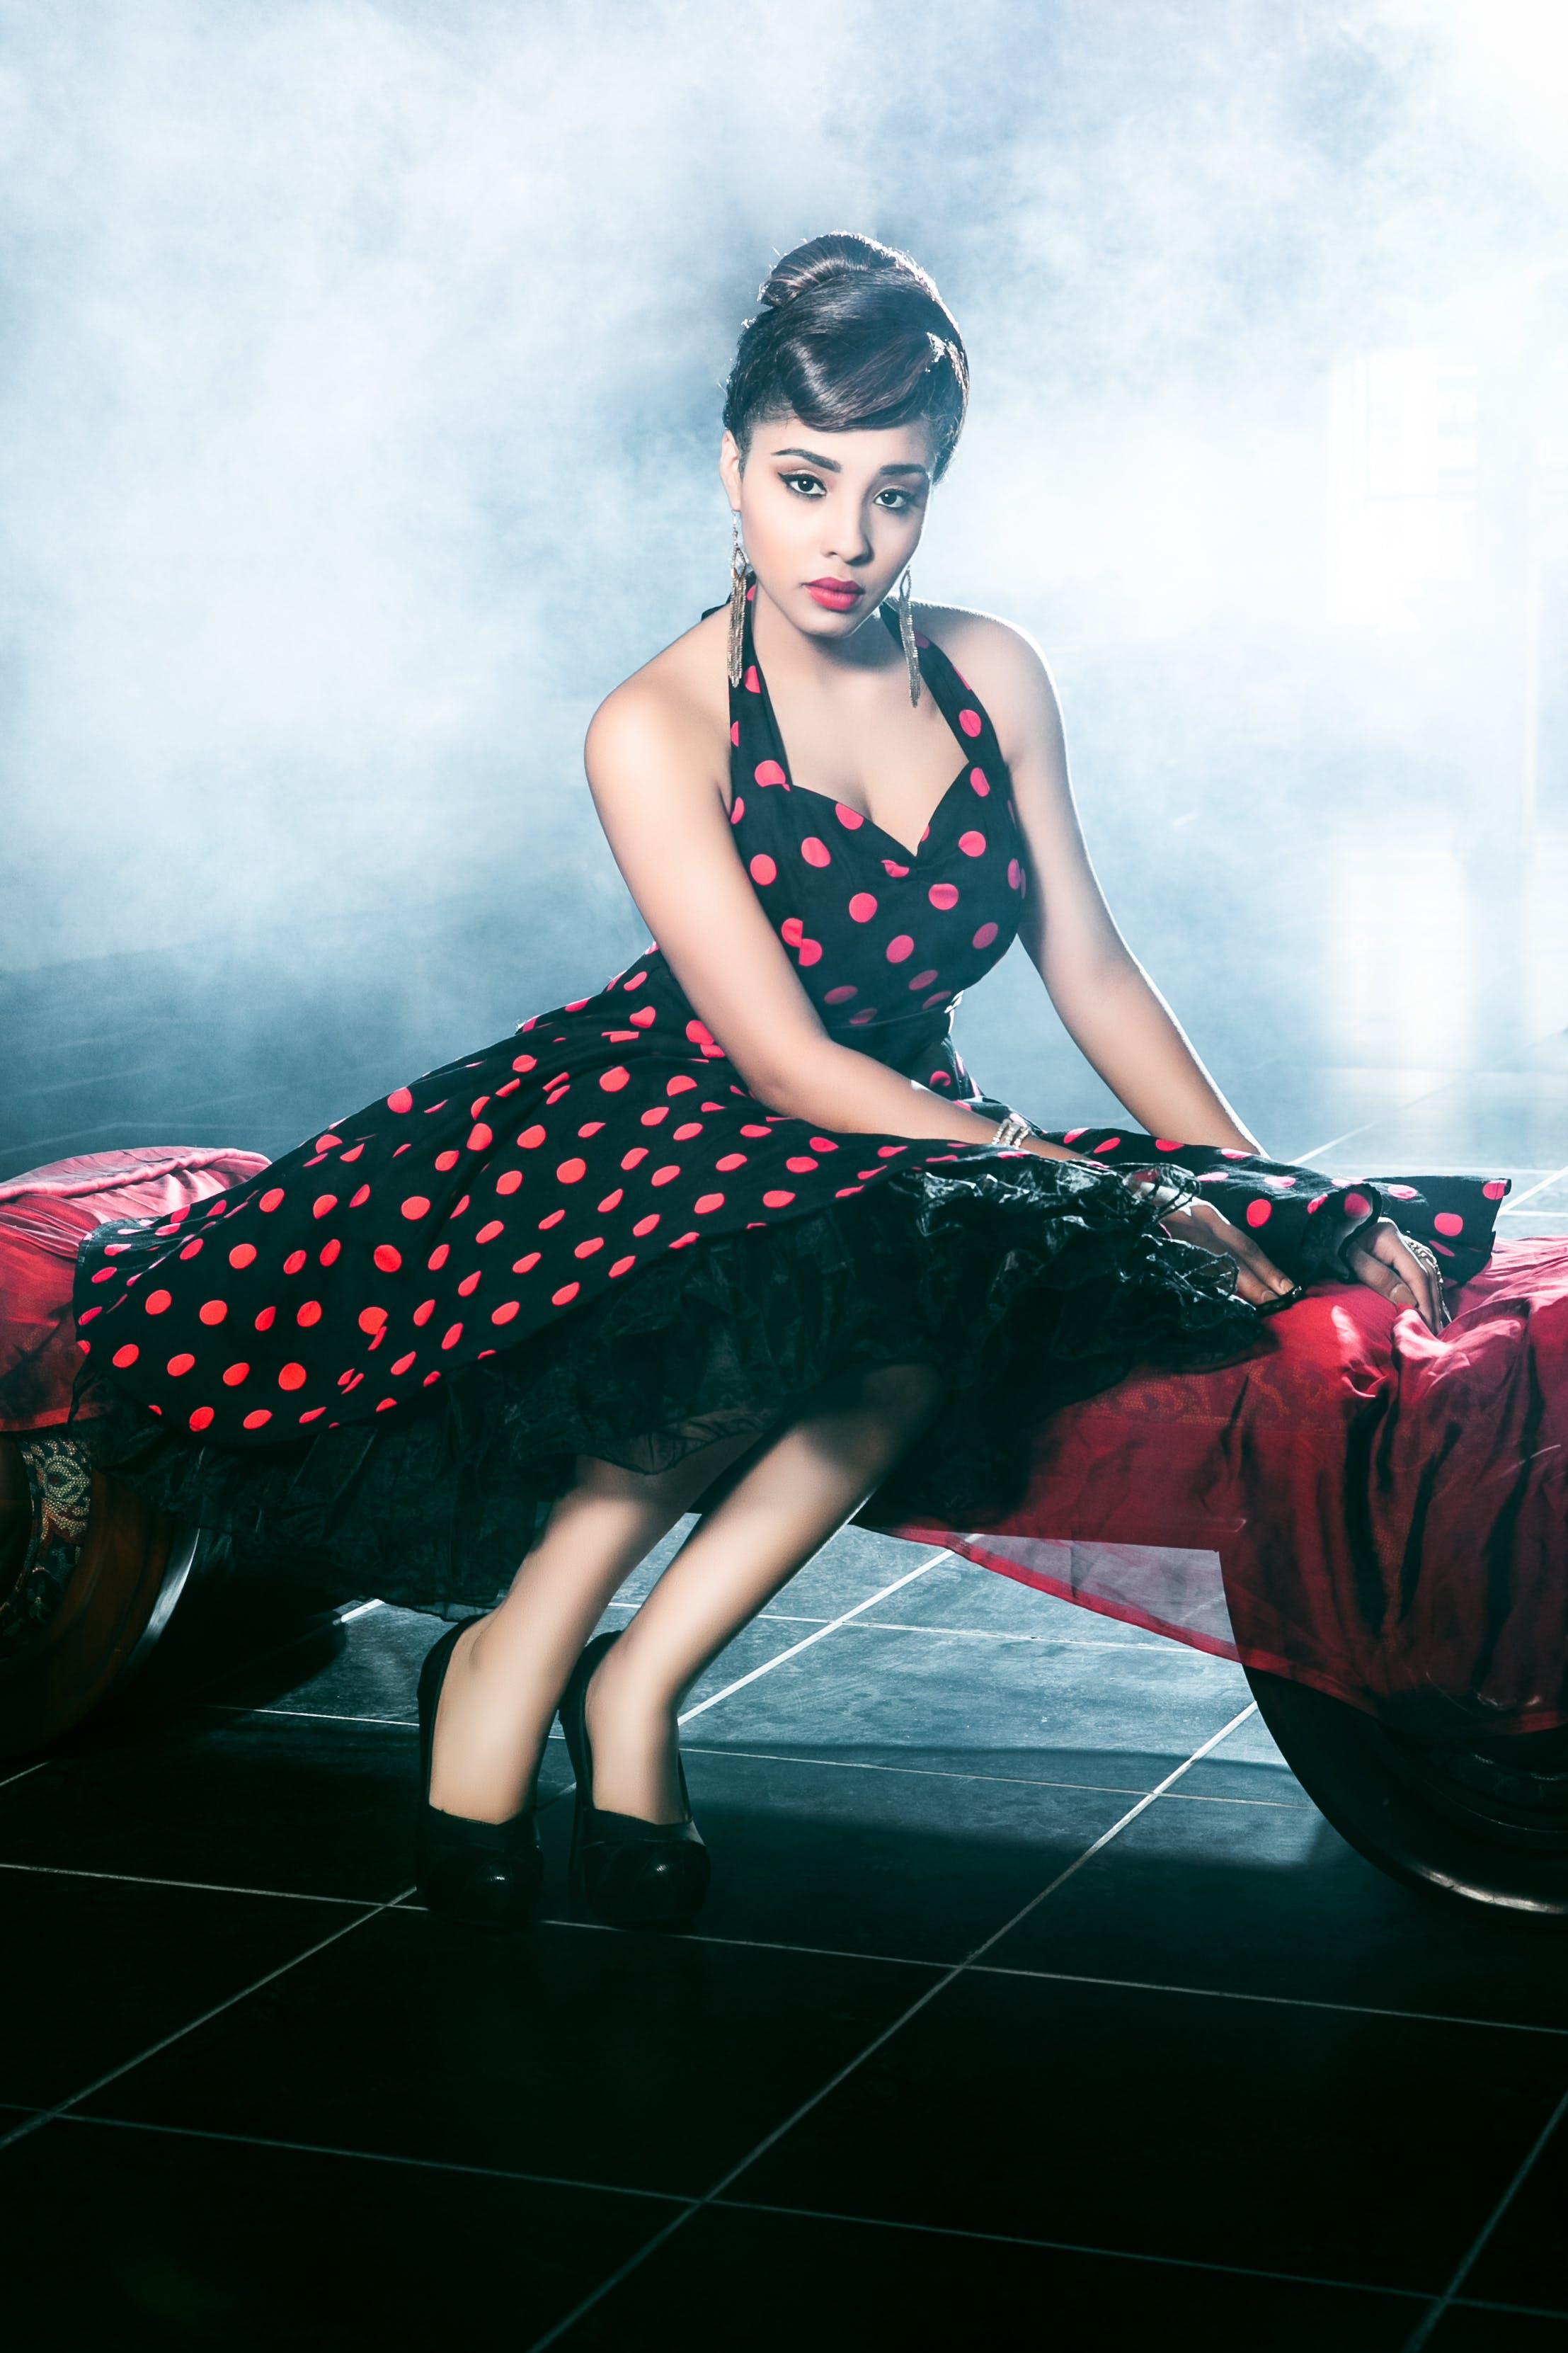 Woman Wearing Black and Red Polka-dot Dress